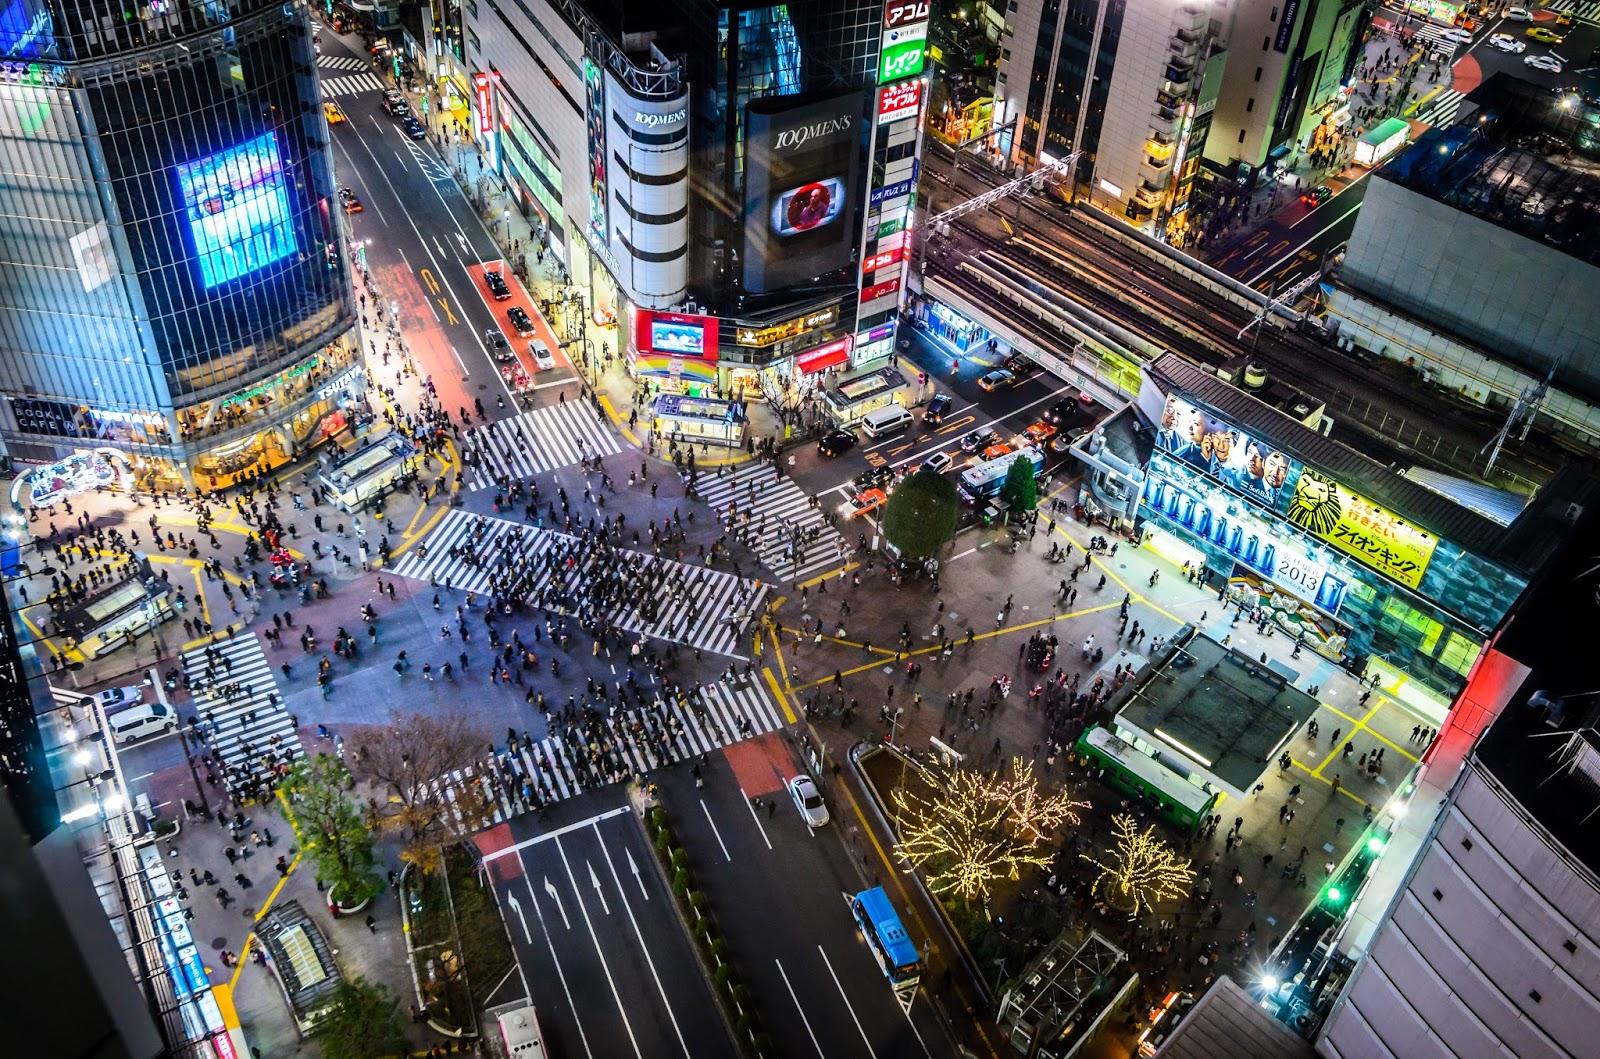 http://hsmithphotography.smugmug.com/LandScapes/Japan/i-gSSWW7Q/A